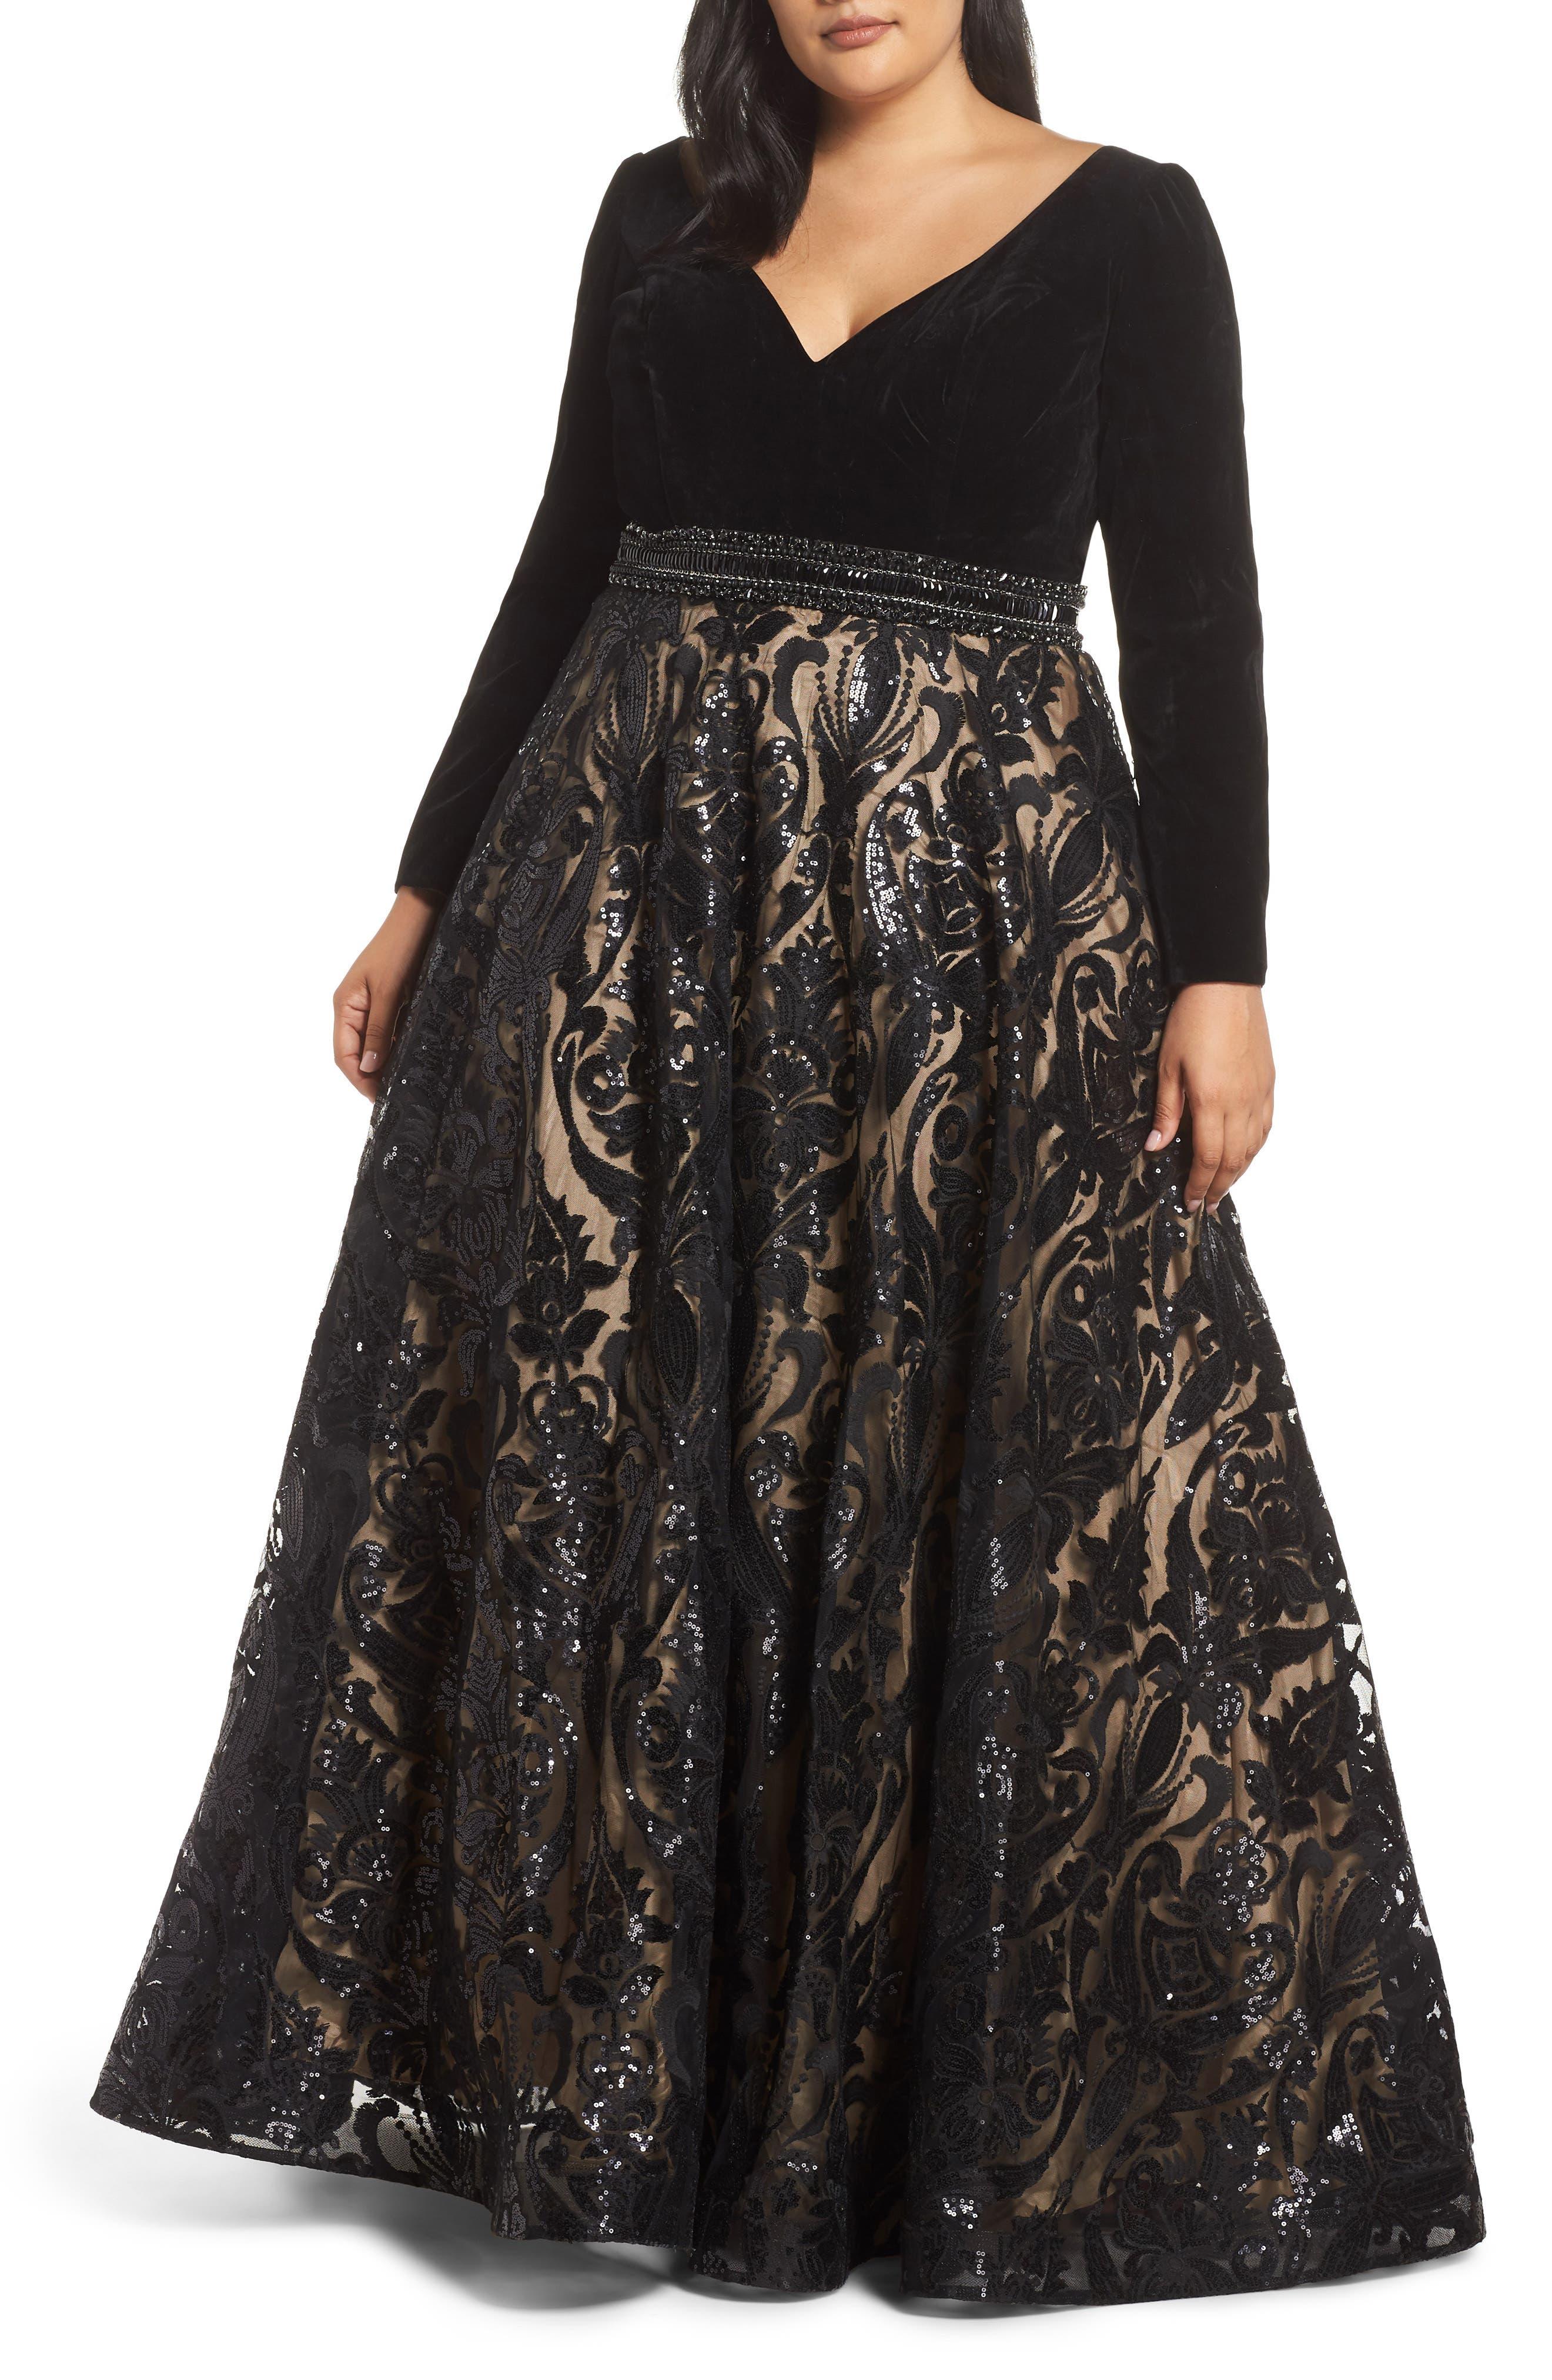 Plus Size MAC Duggal Velvet & Sequin Jacquard Ballgown